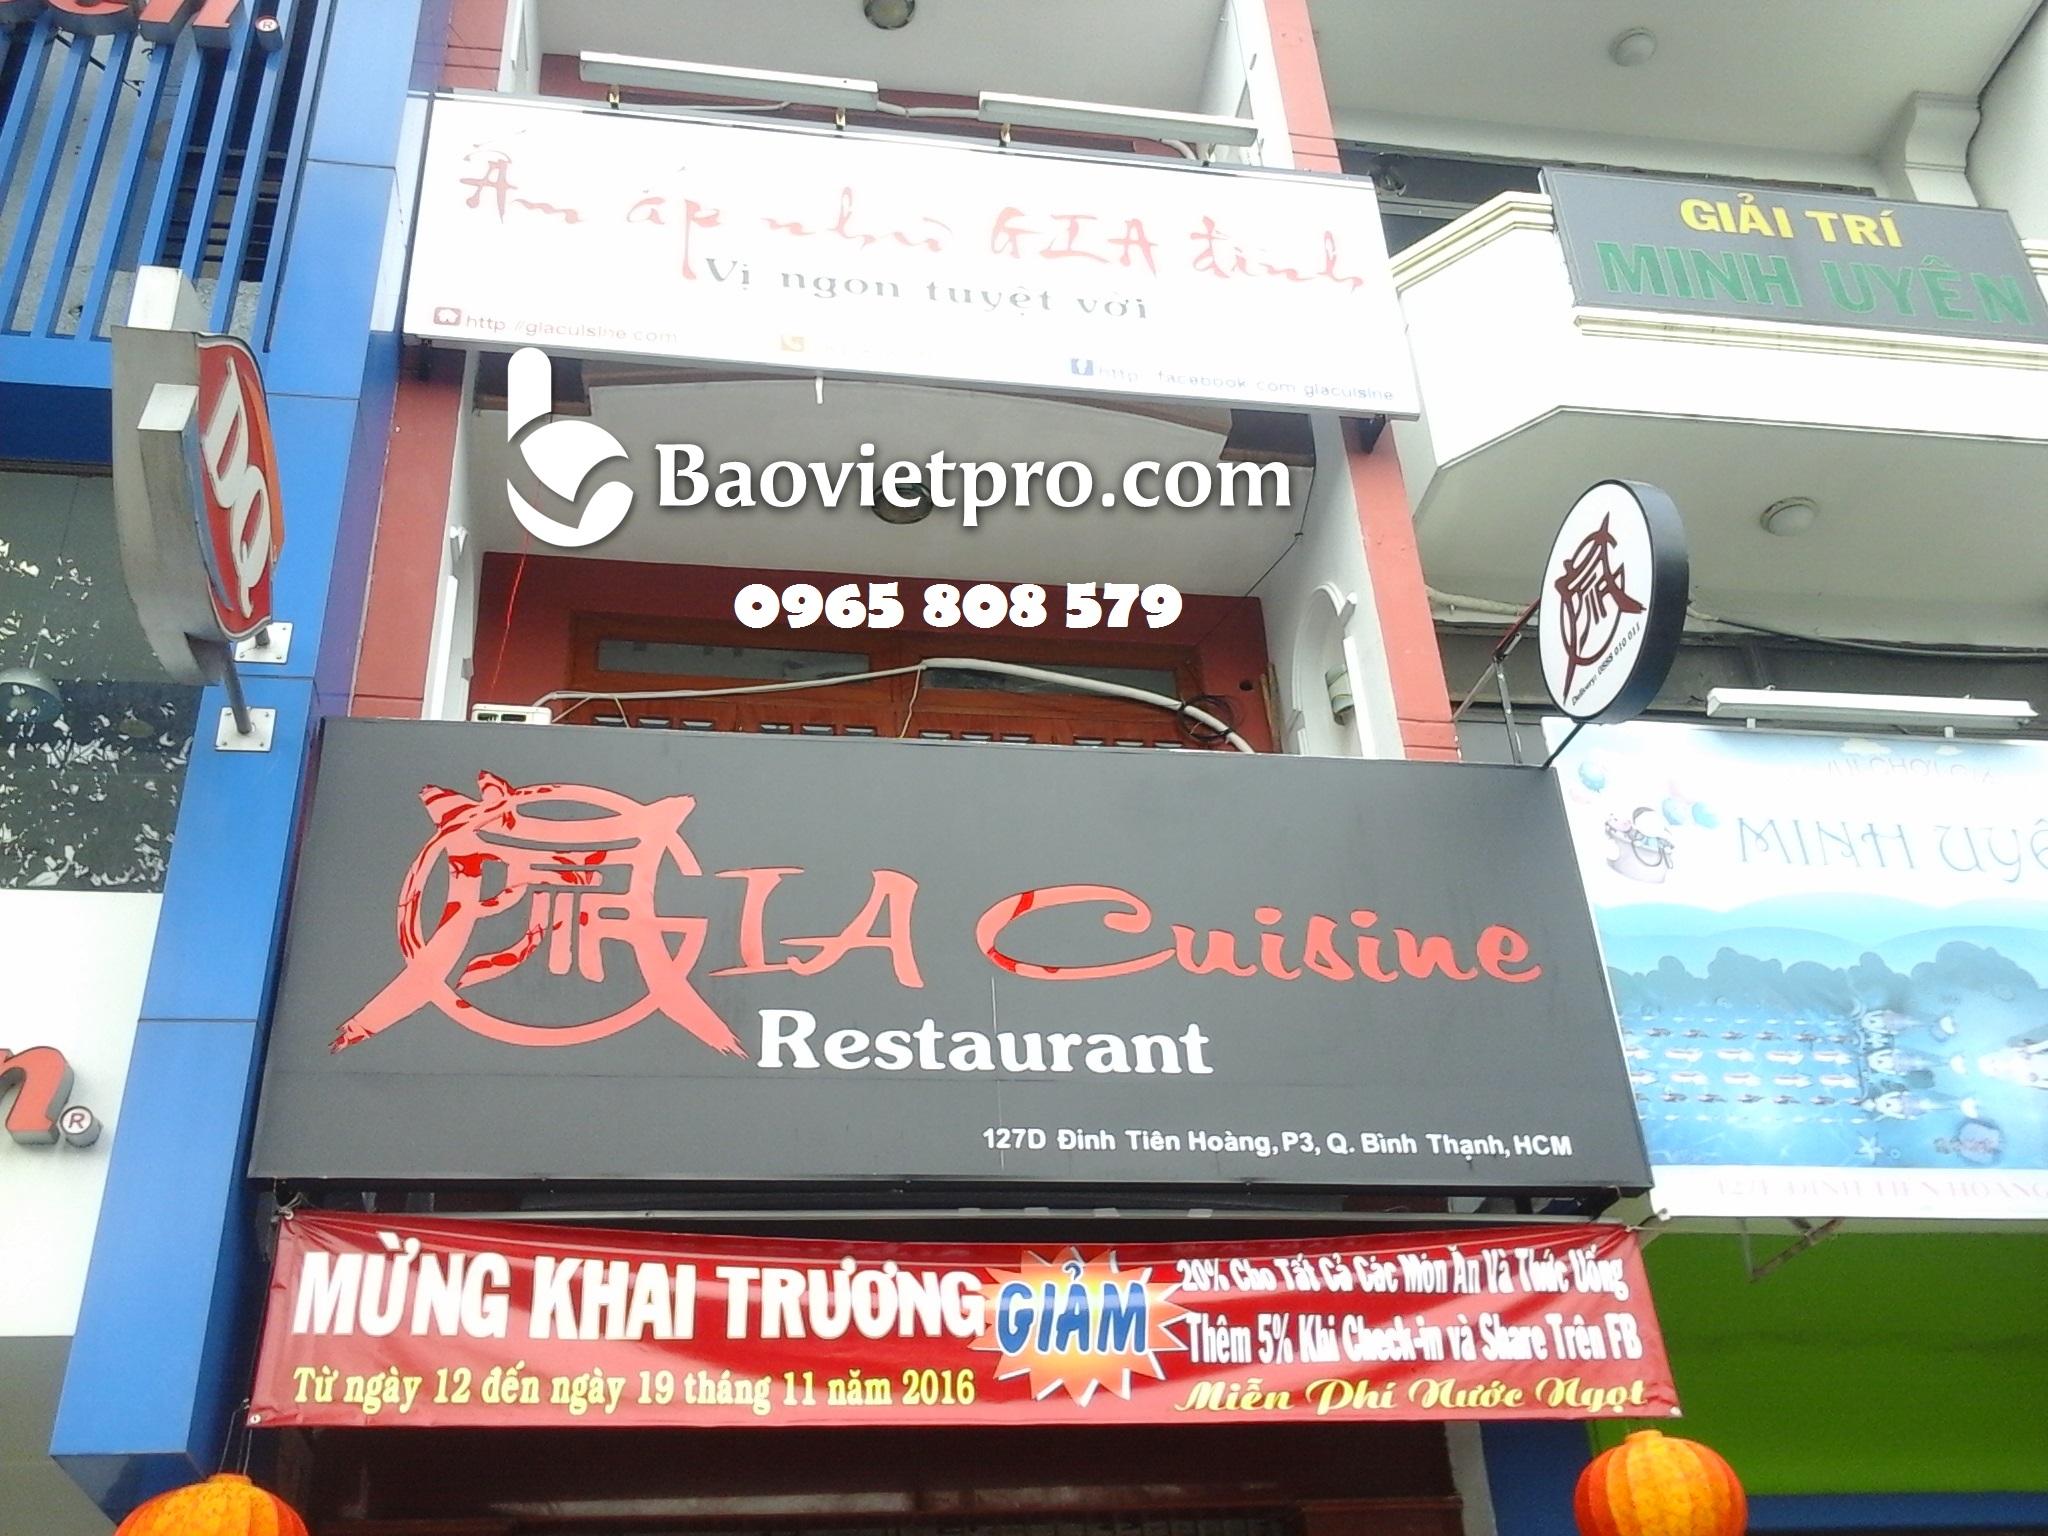 bang-hieu-alu-cat-cnc-chu-mica-gia-cuisine-1-2